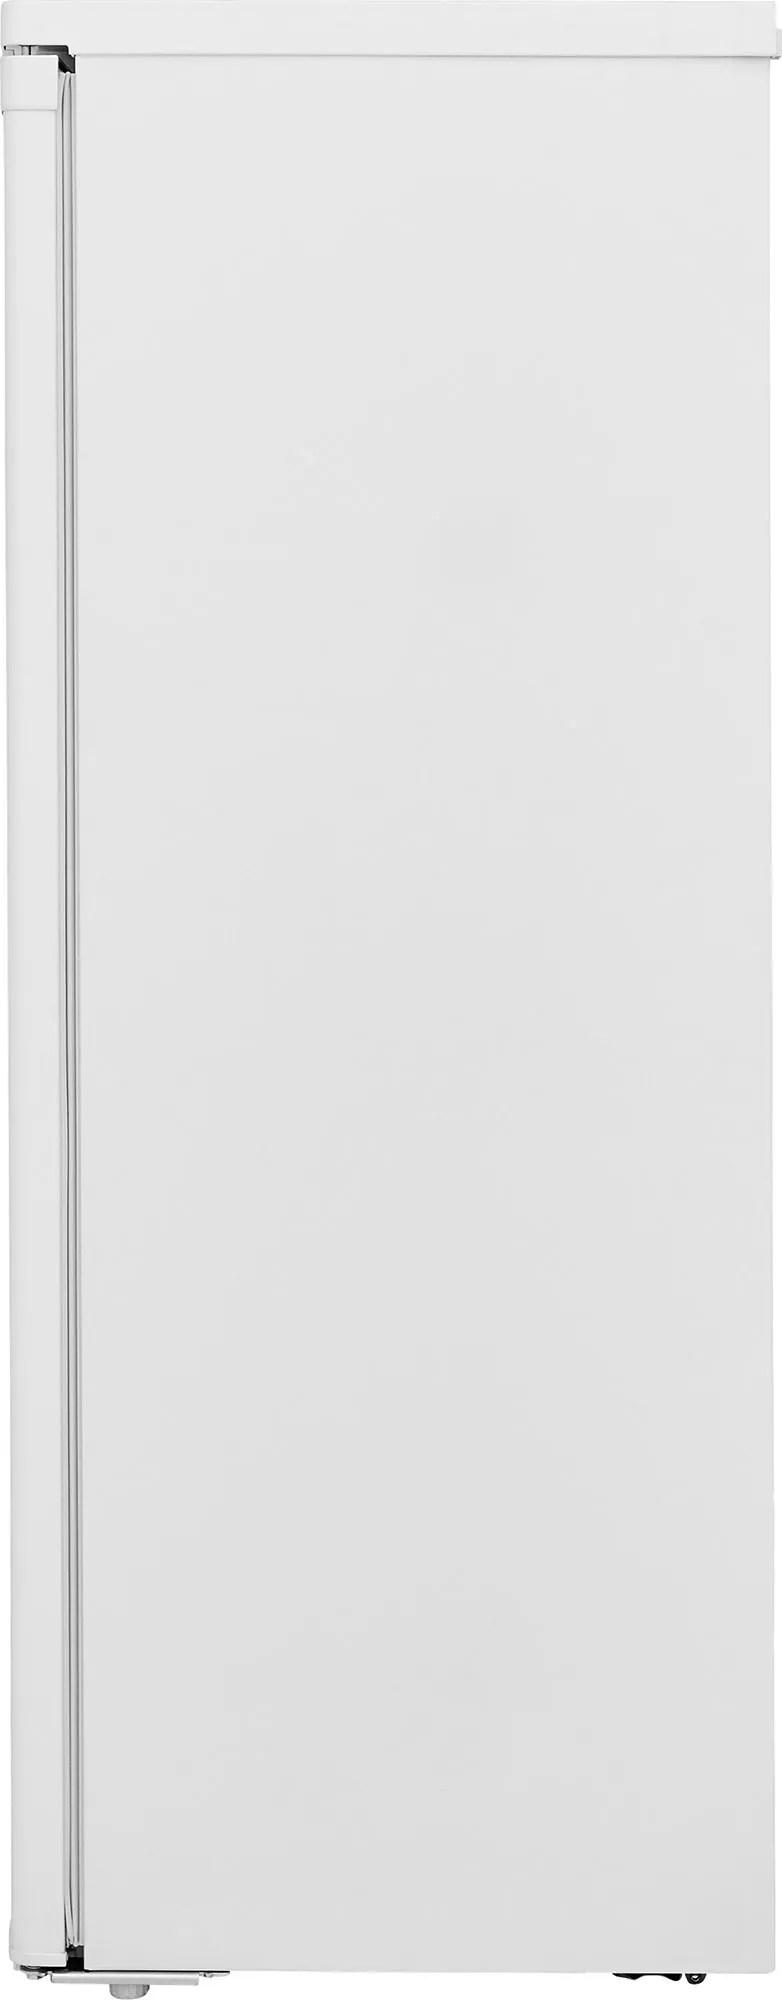 Frigidaire® 5.8 Cu. Ft. White Upright Freezer-FFFU06M1TW